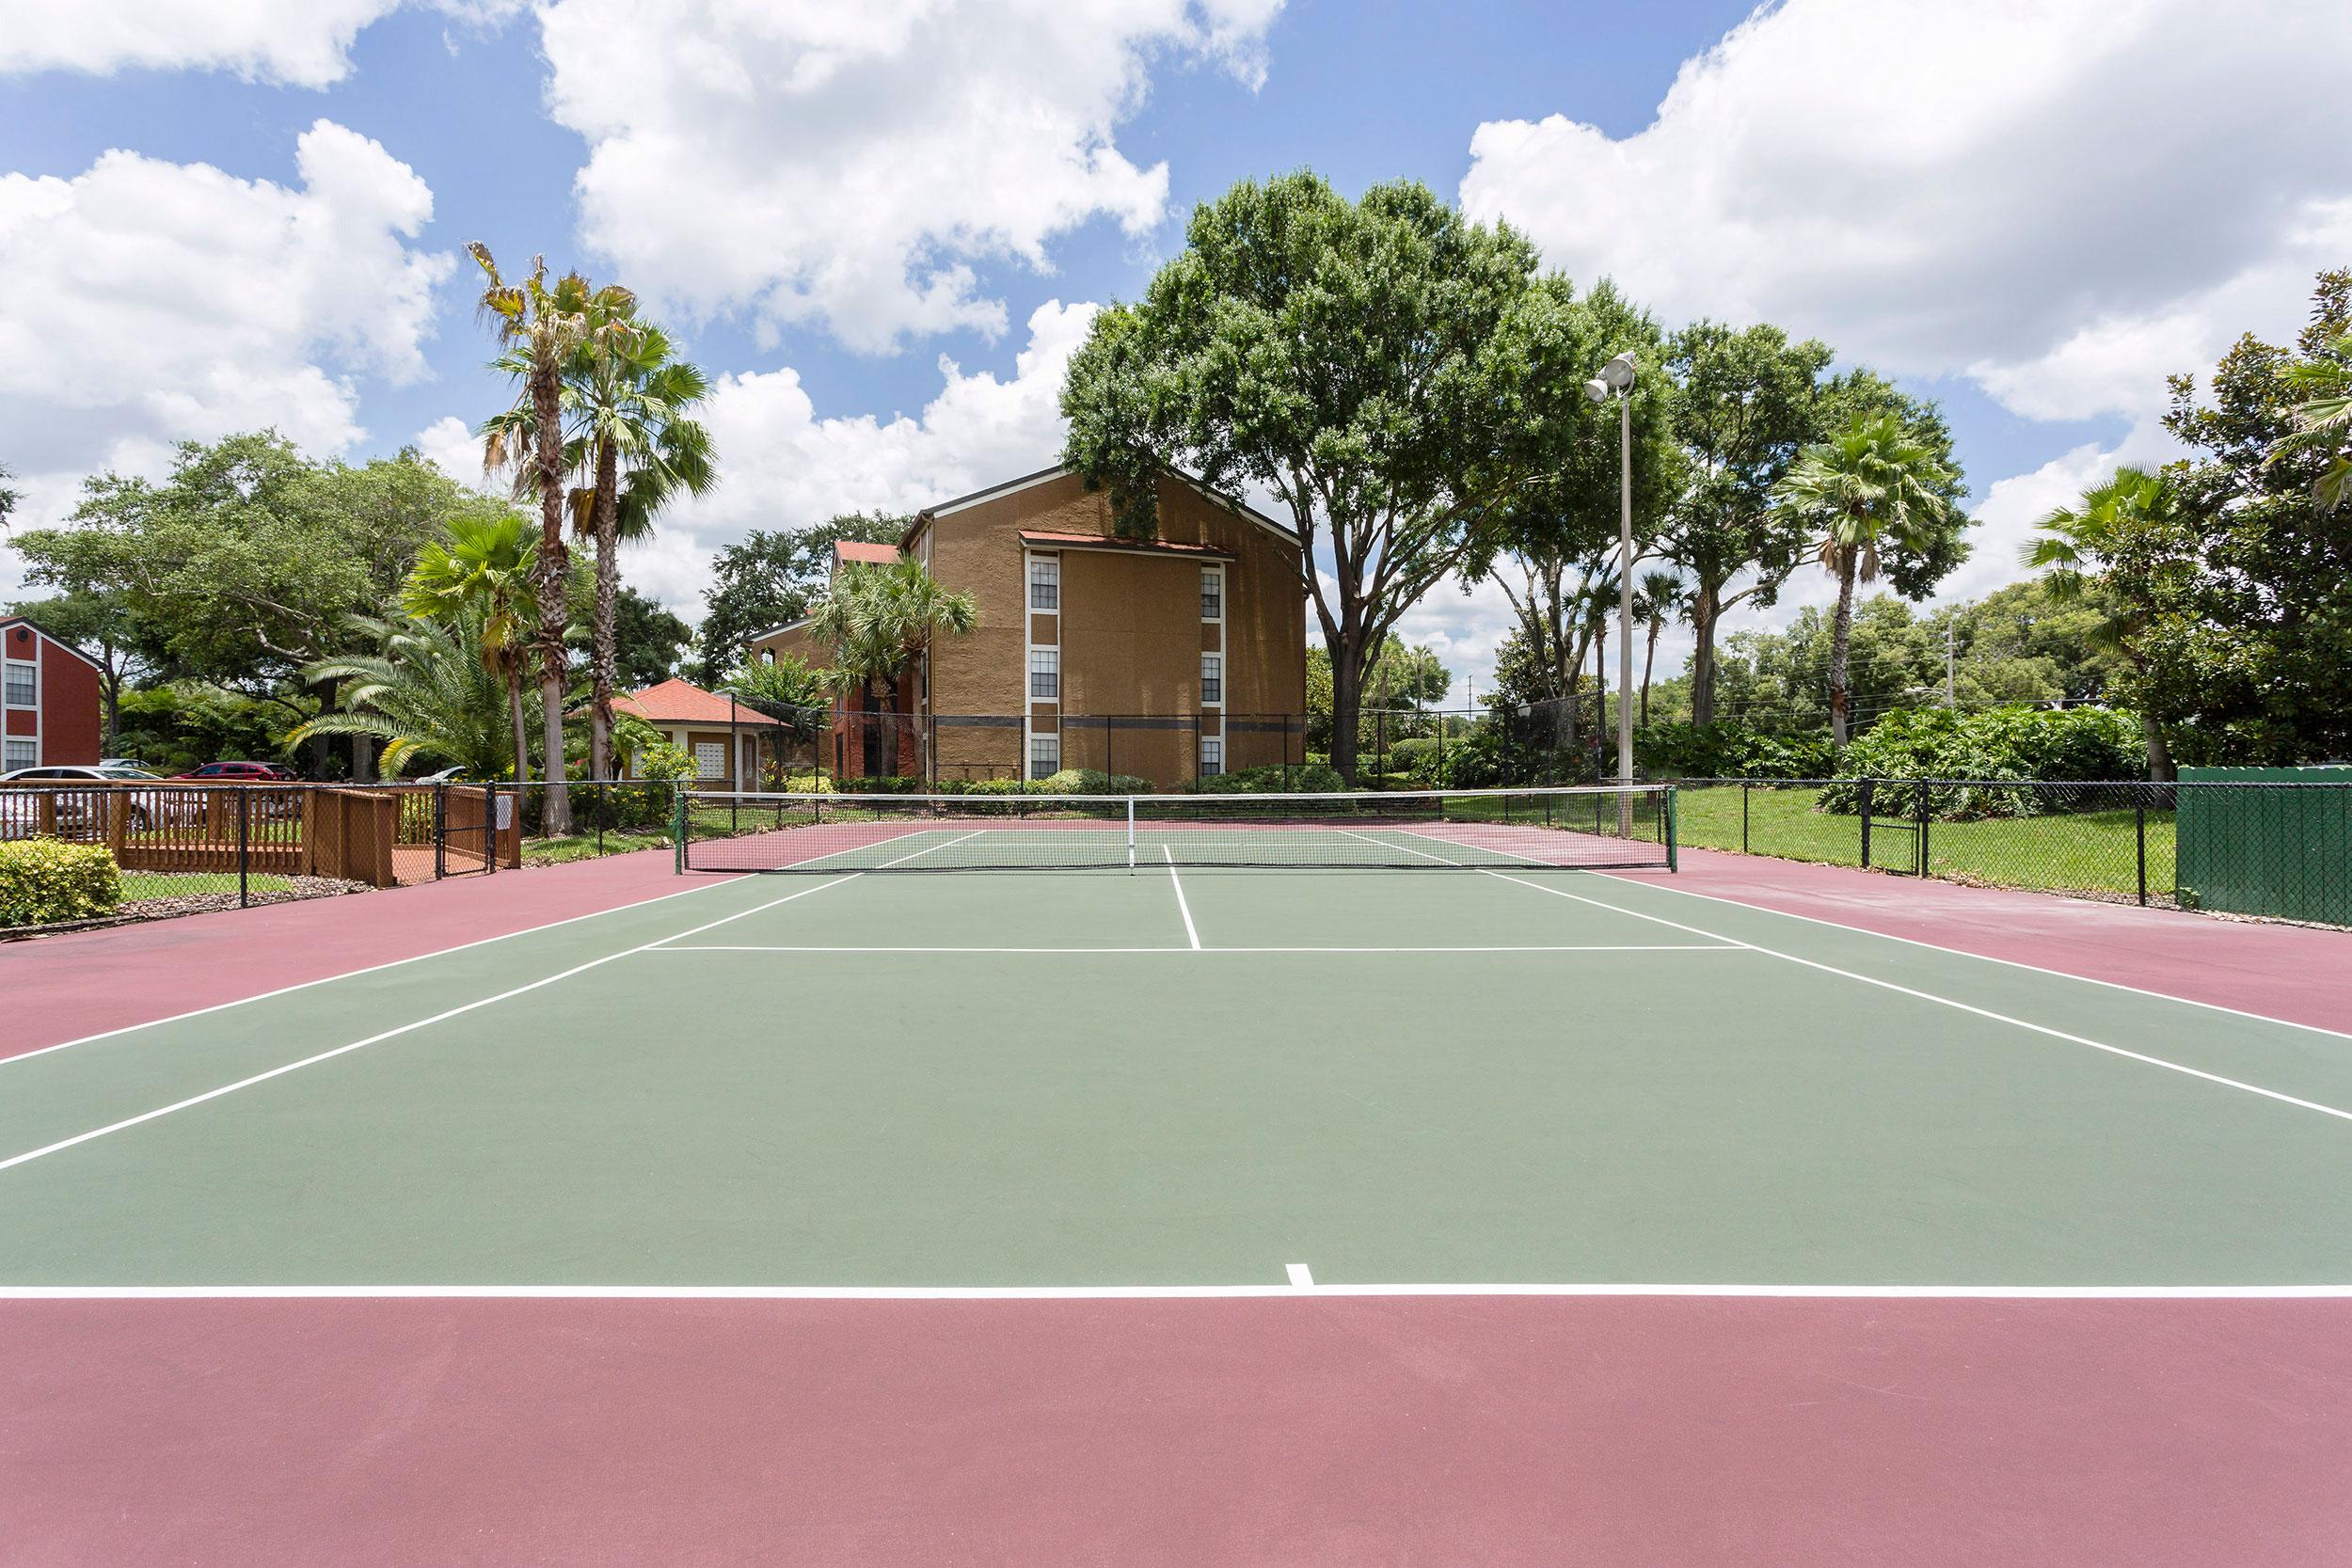 Cf-amen-tennis